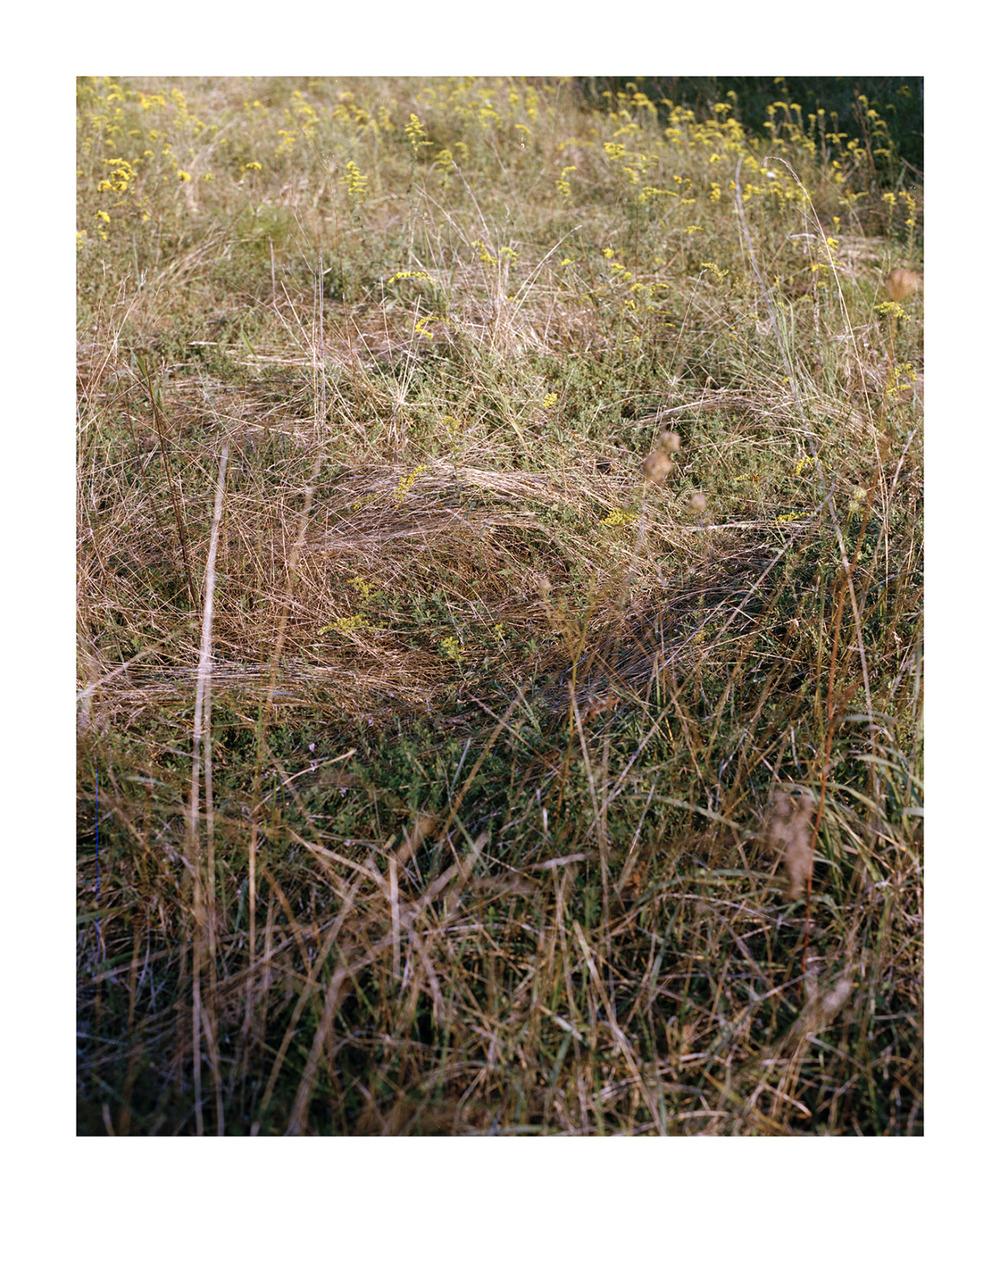 deer bed/borrowed resting place